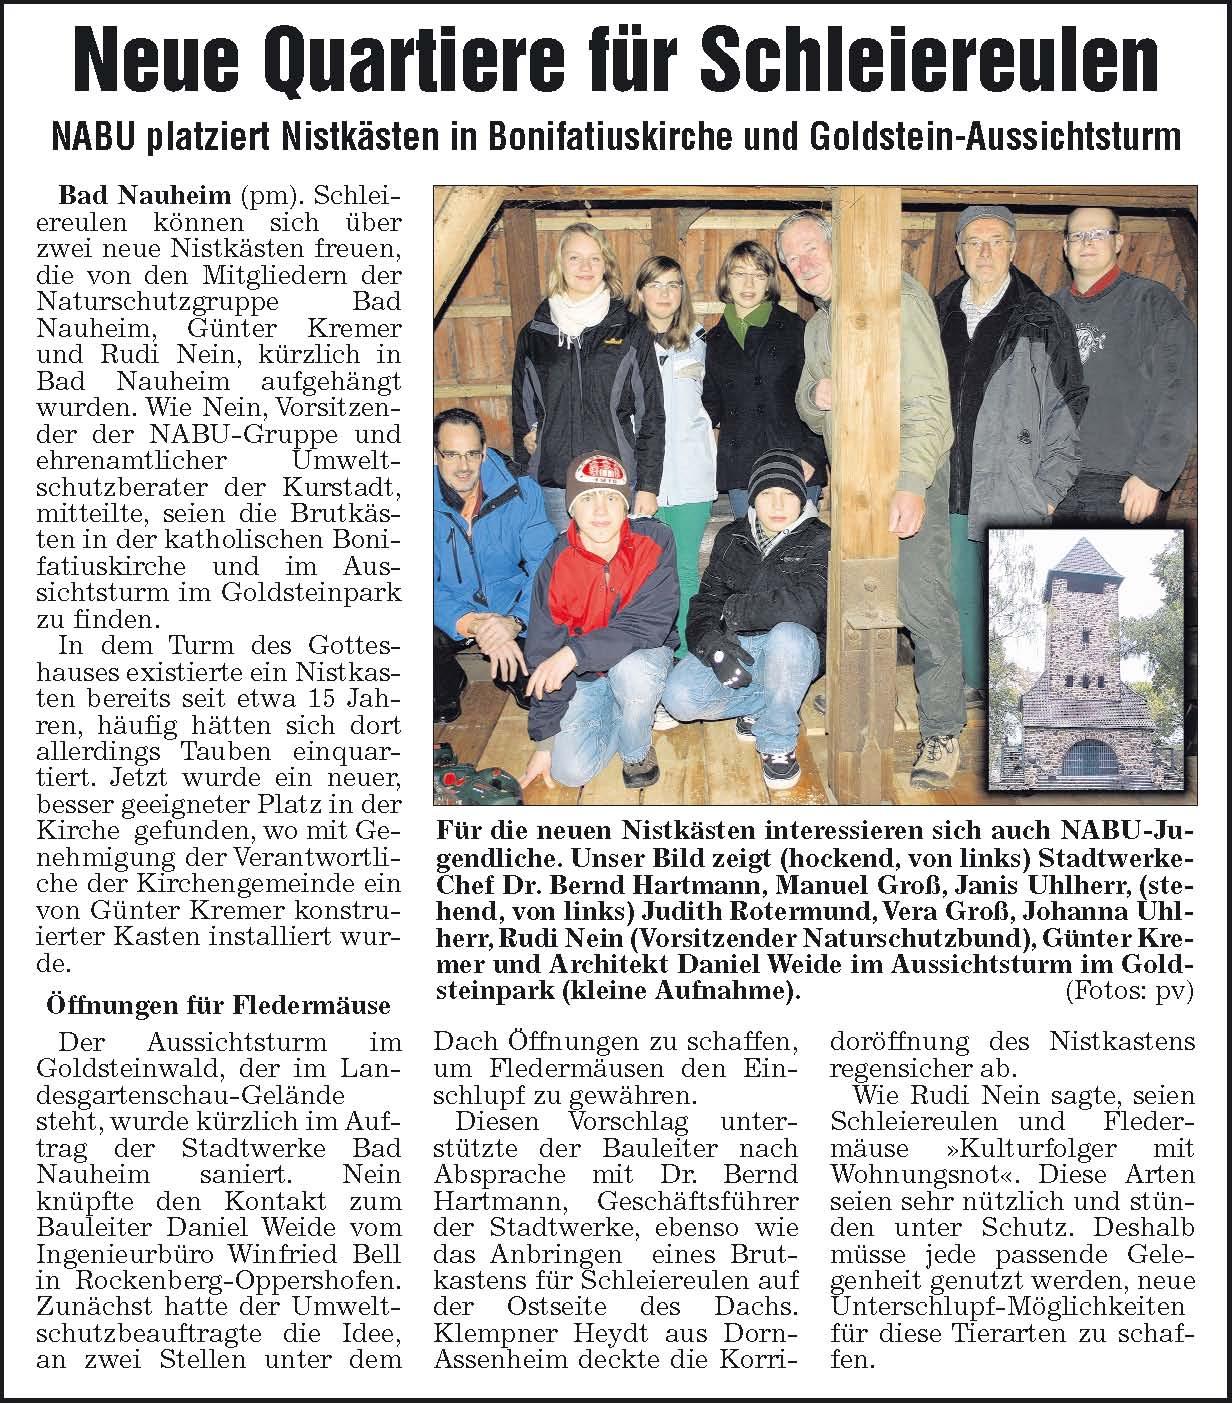 Bericht Wetterauer Zeitung 02.12.2009